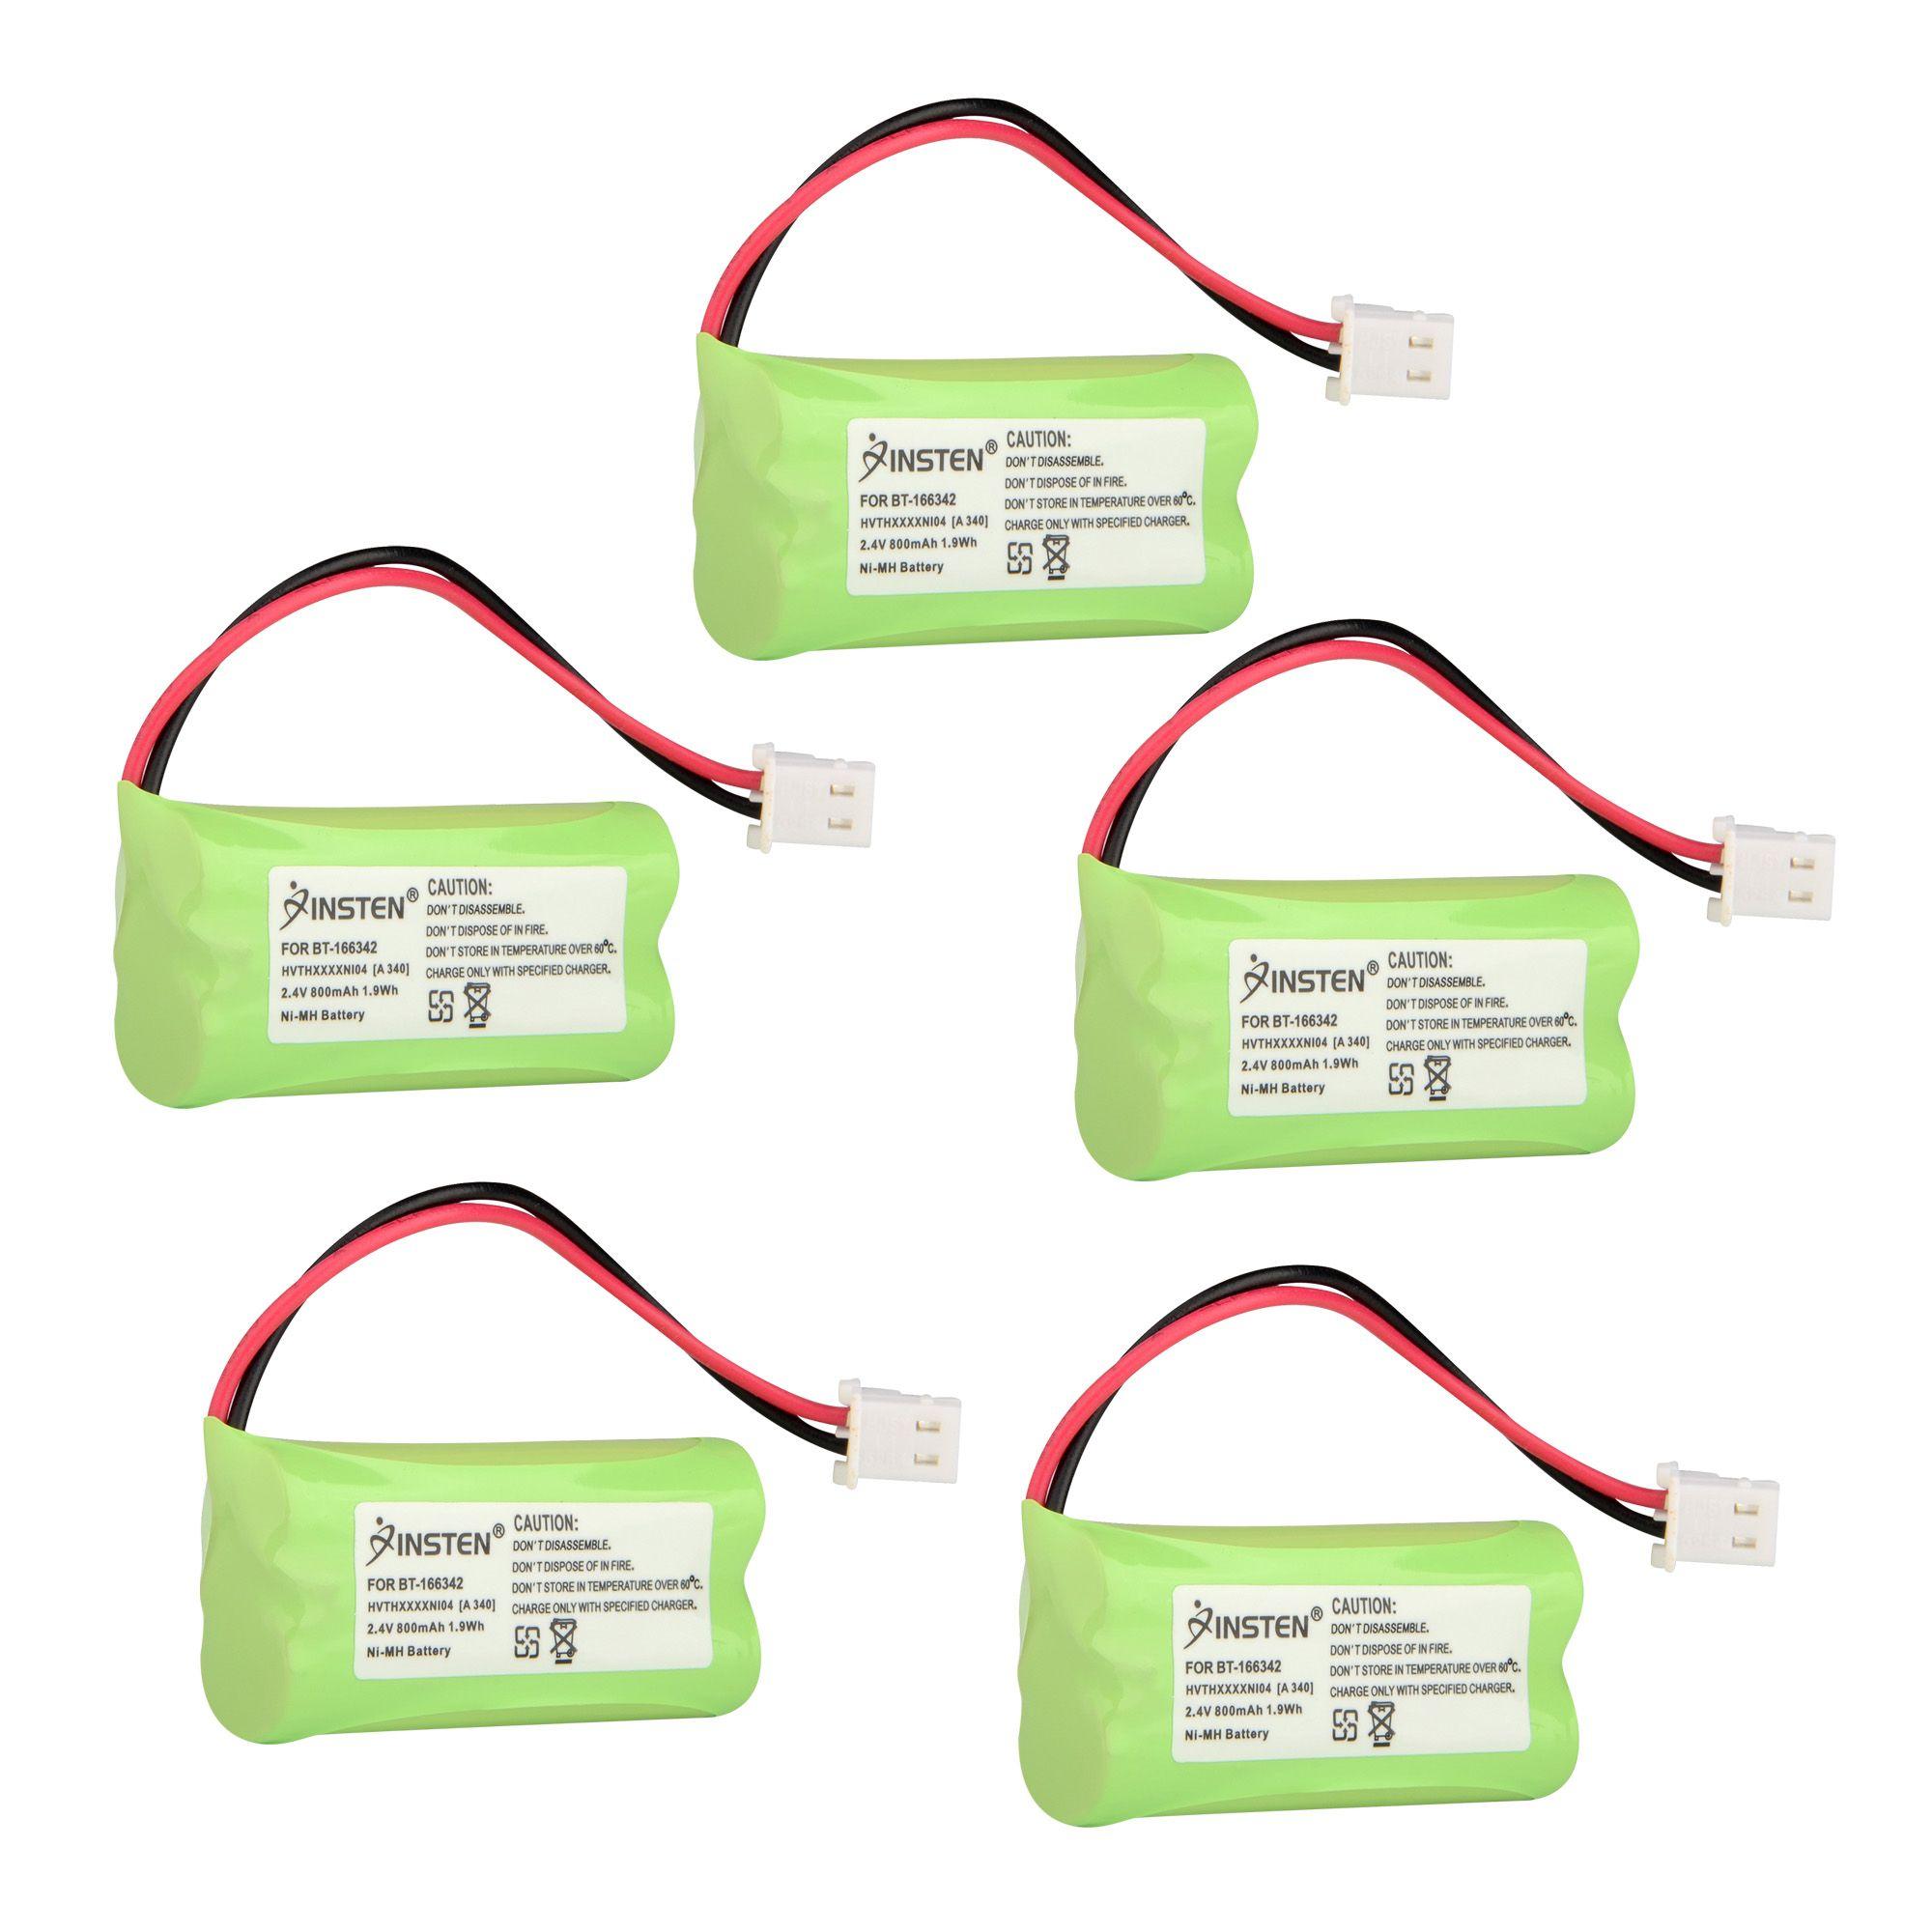 Insten (5 Pack) Extra Ni-Mh Cordless Phone Battery For Vtech BT-166342 89-1347-01-00 BT-1183342 BT262342 BT-266342 (5-Pack Bundle)